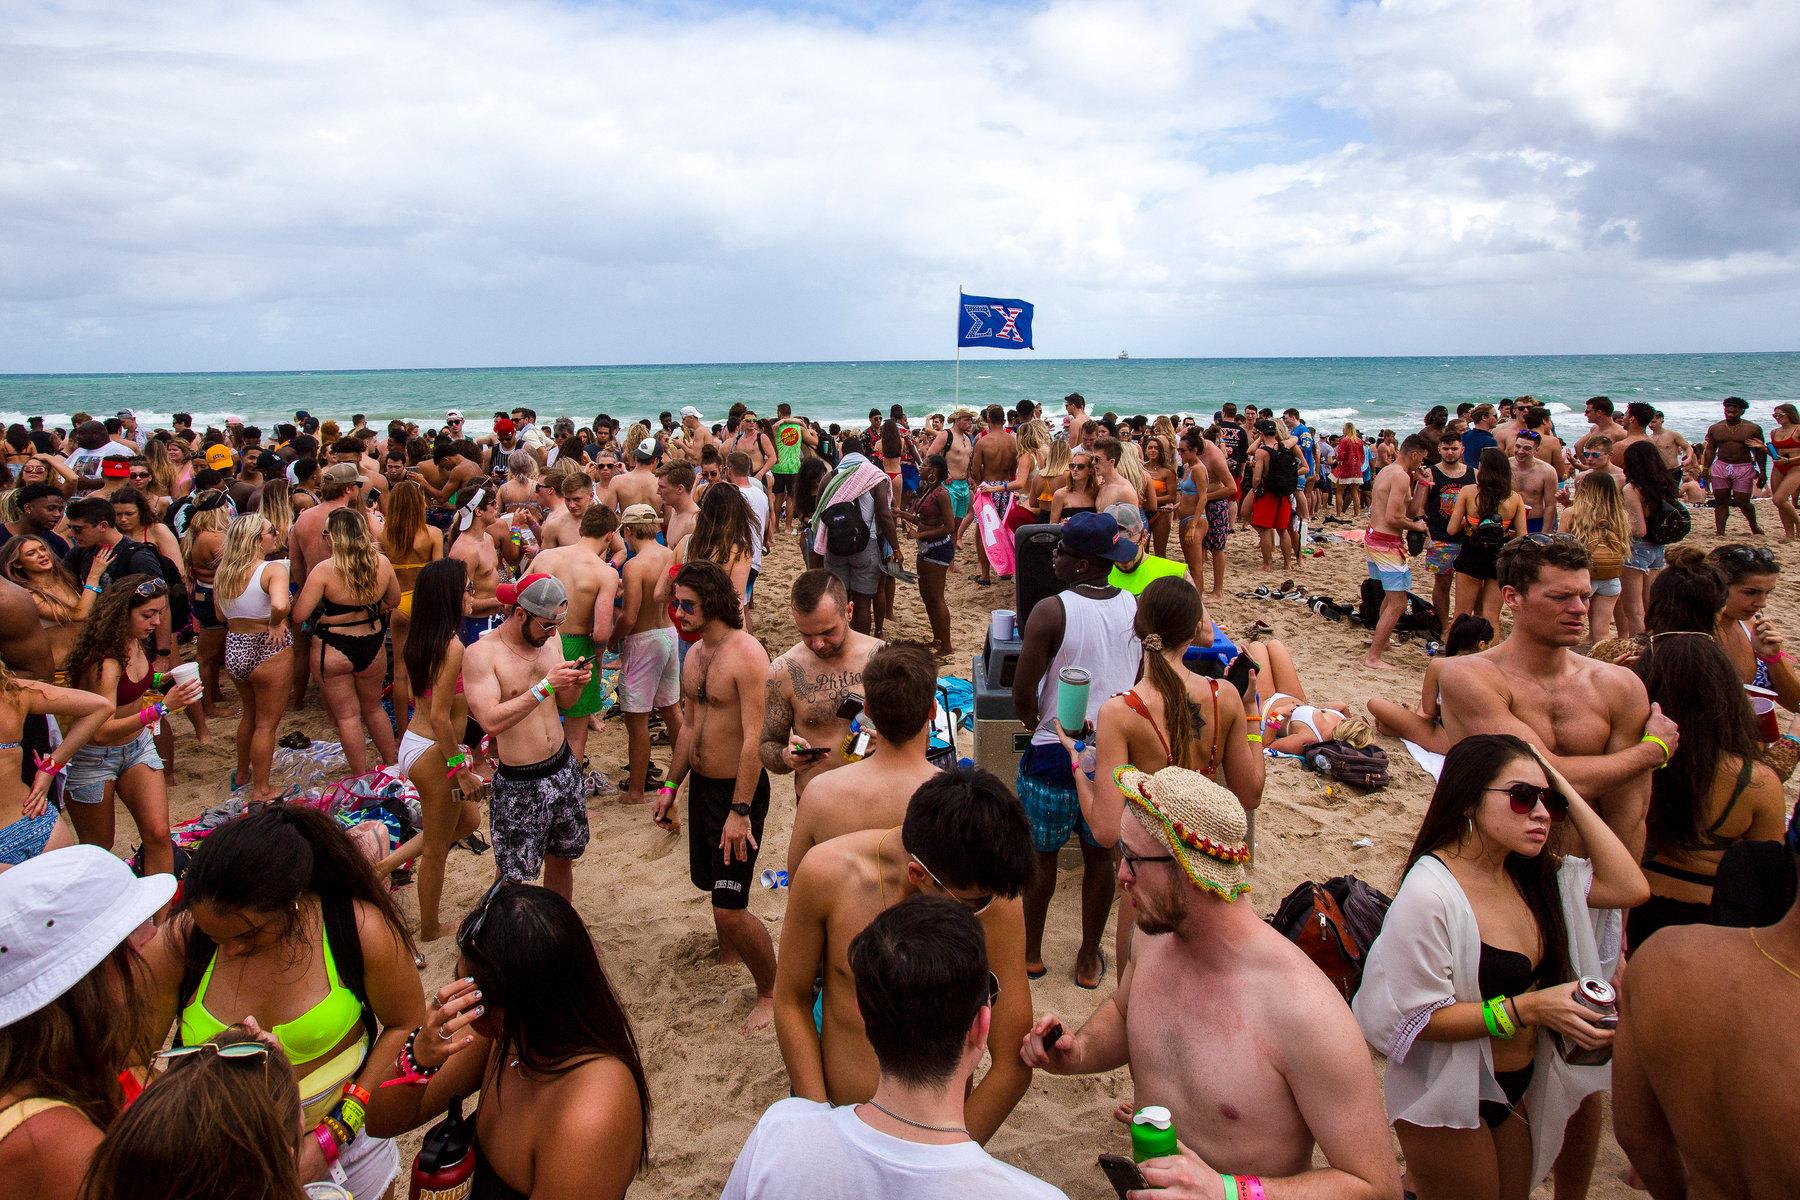 44 Texas Students Have Coronavirus After Spring Break Trip Pertaining To Tampa University Spring Break